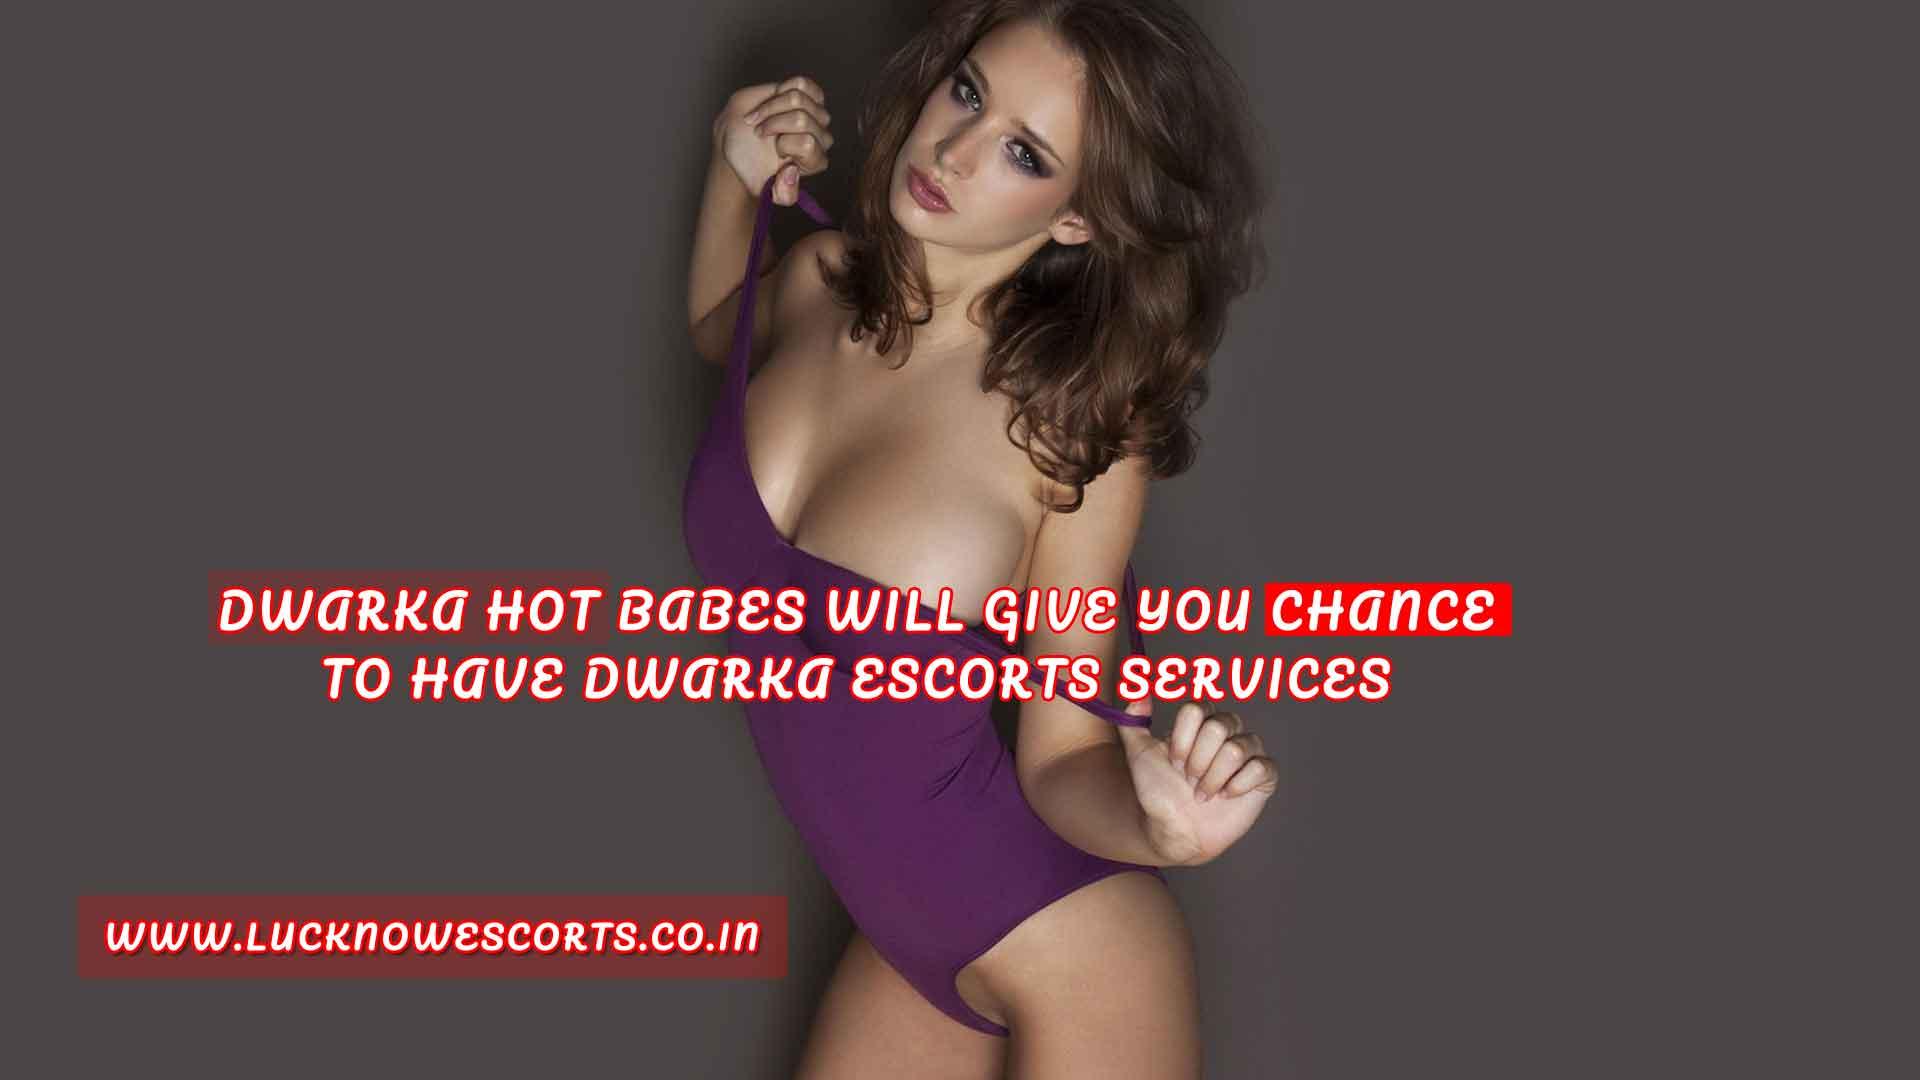 dwarka-escort